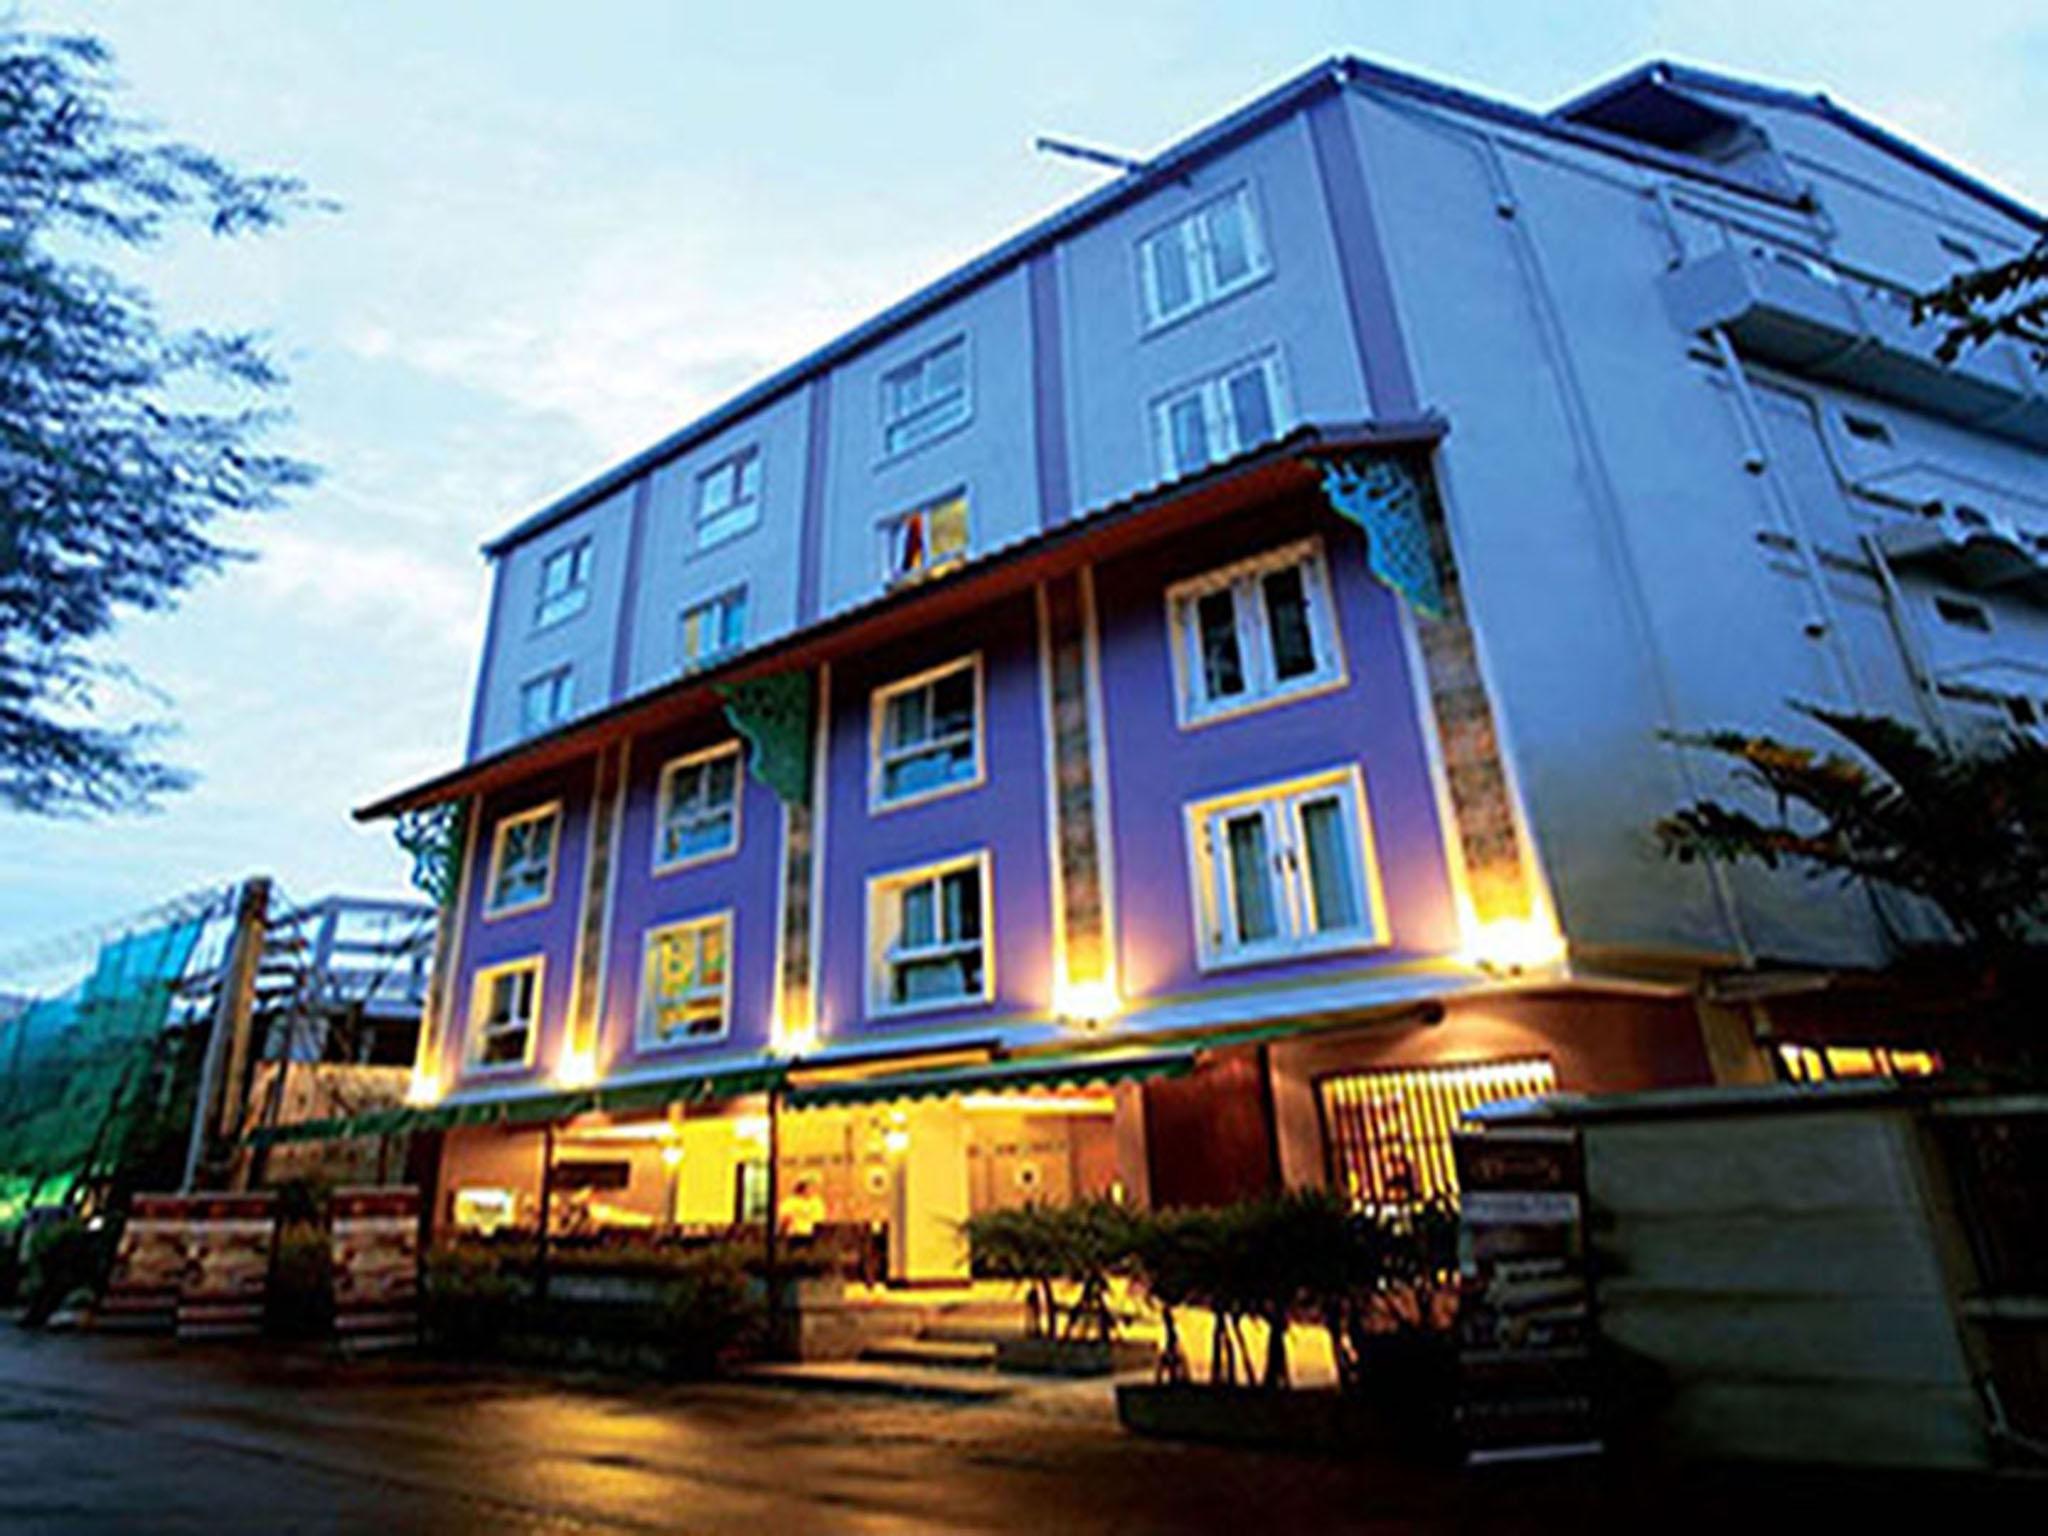 Sawasdee Hotel Sukhumvit Soi 8 - Bangkok